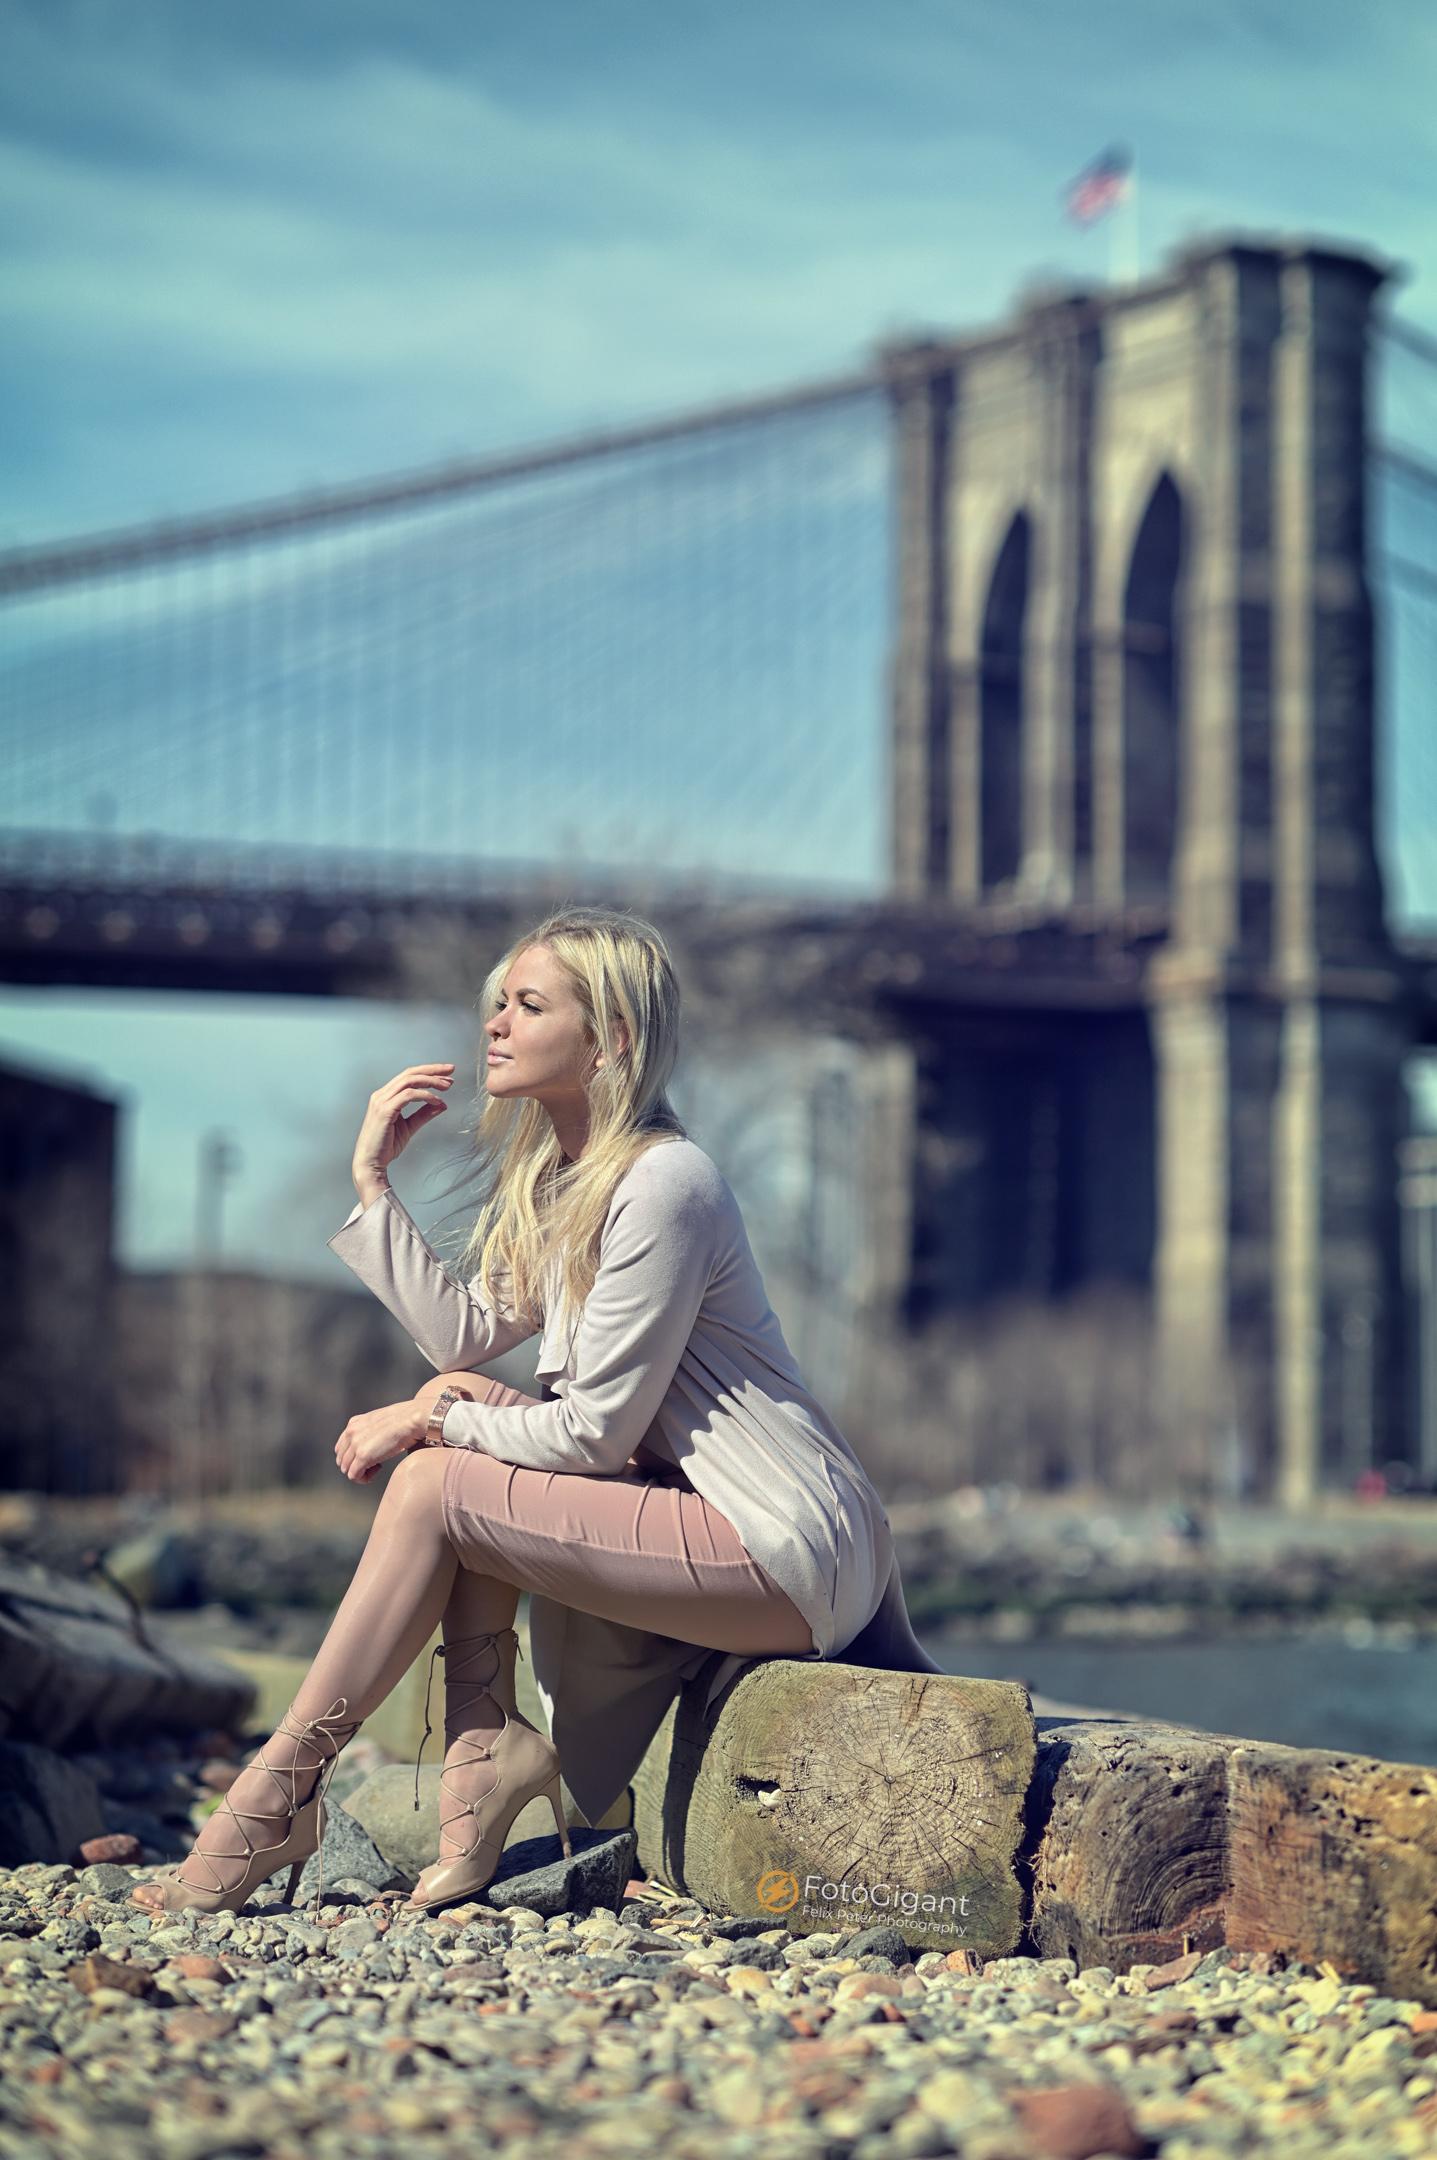 NewYork_JuliaKolomiyets_Fashionphotography_13.jpg